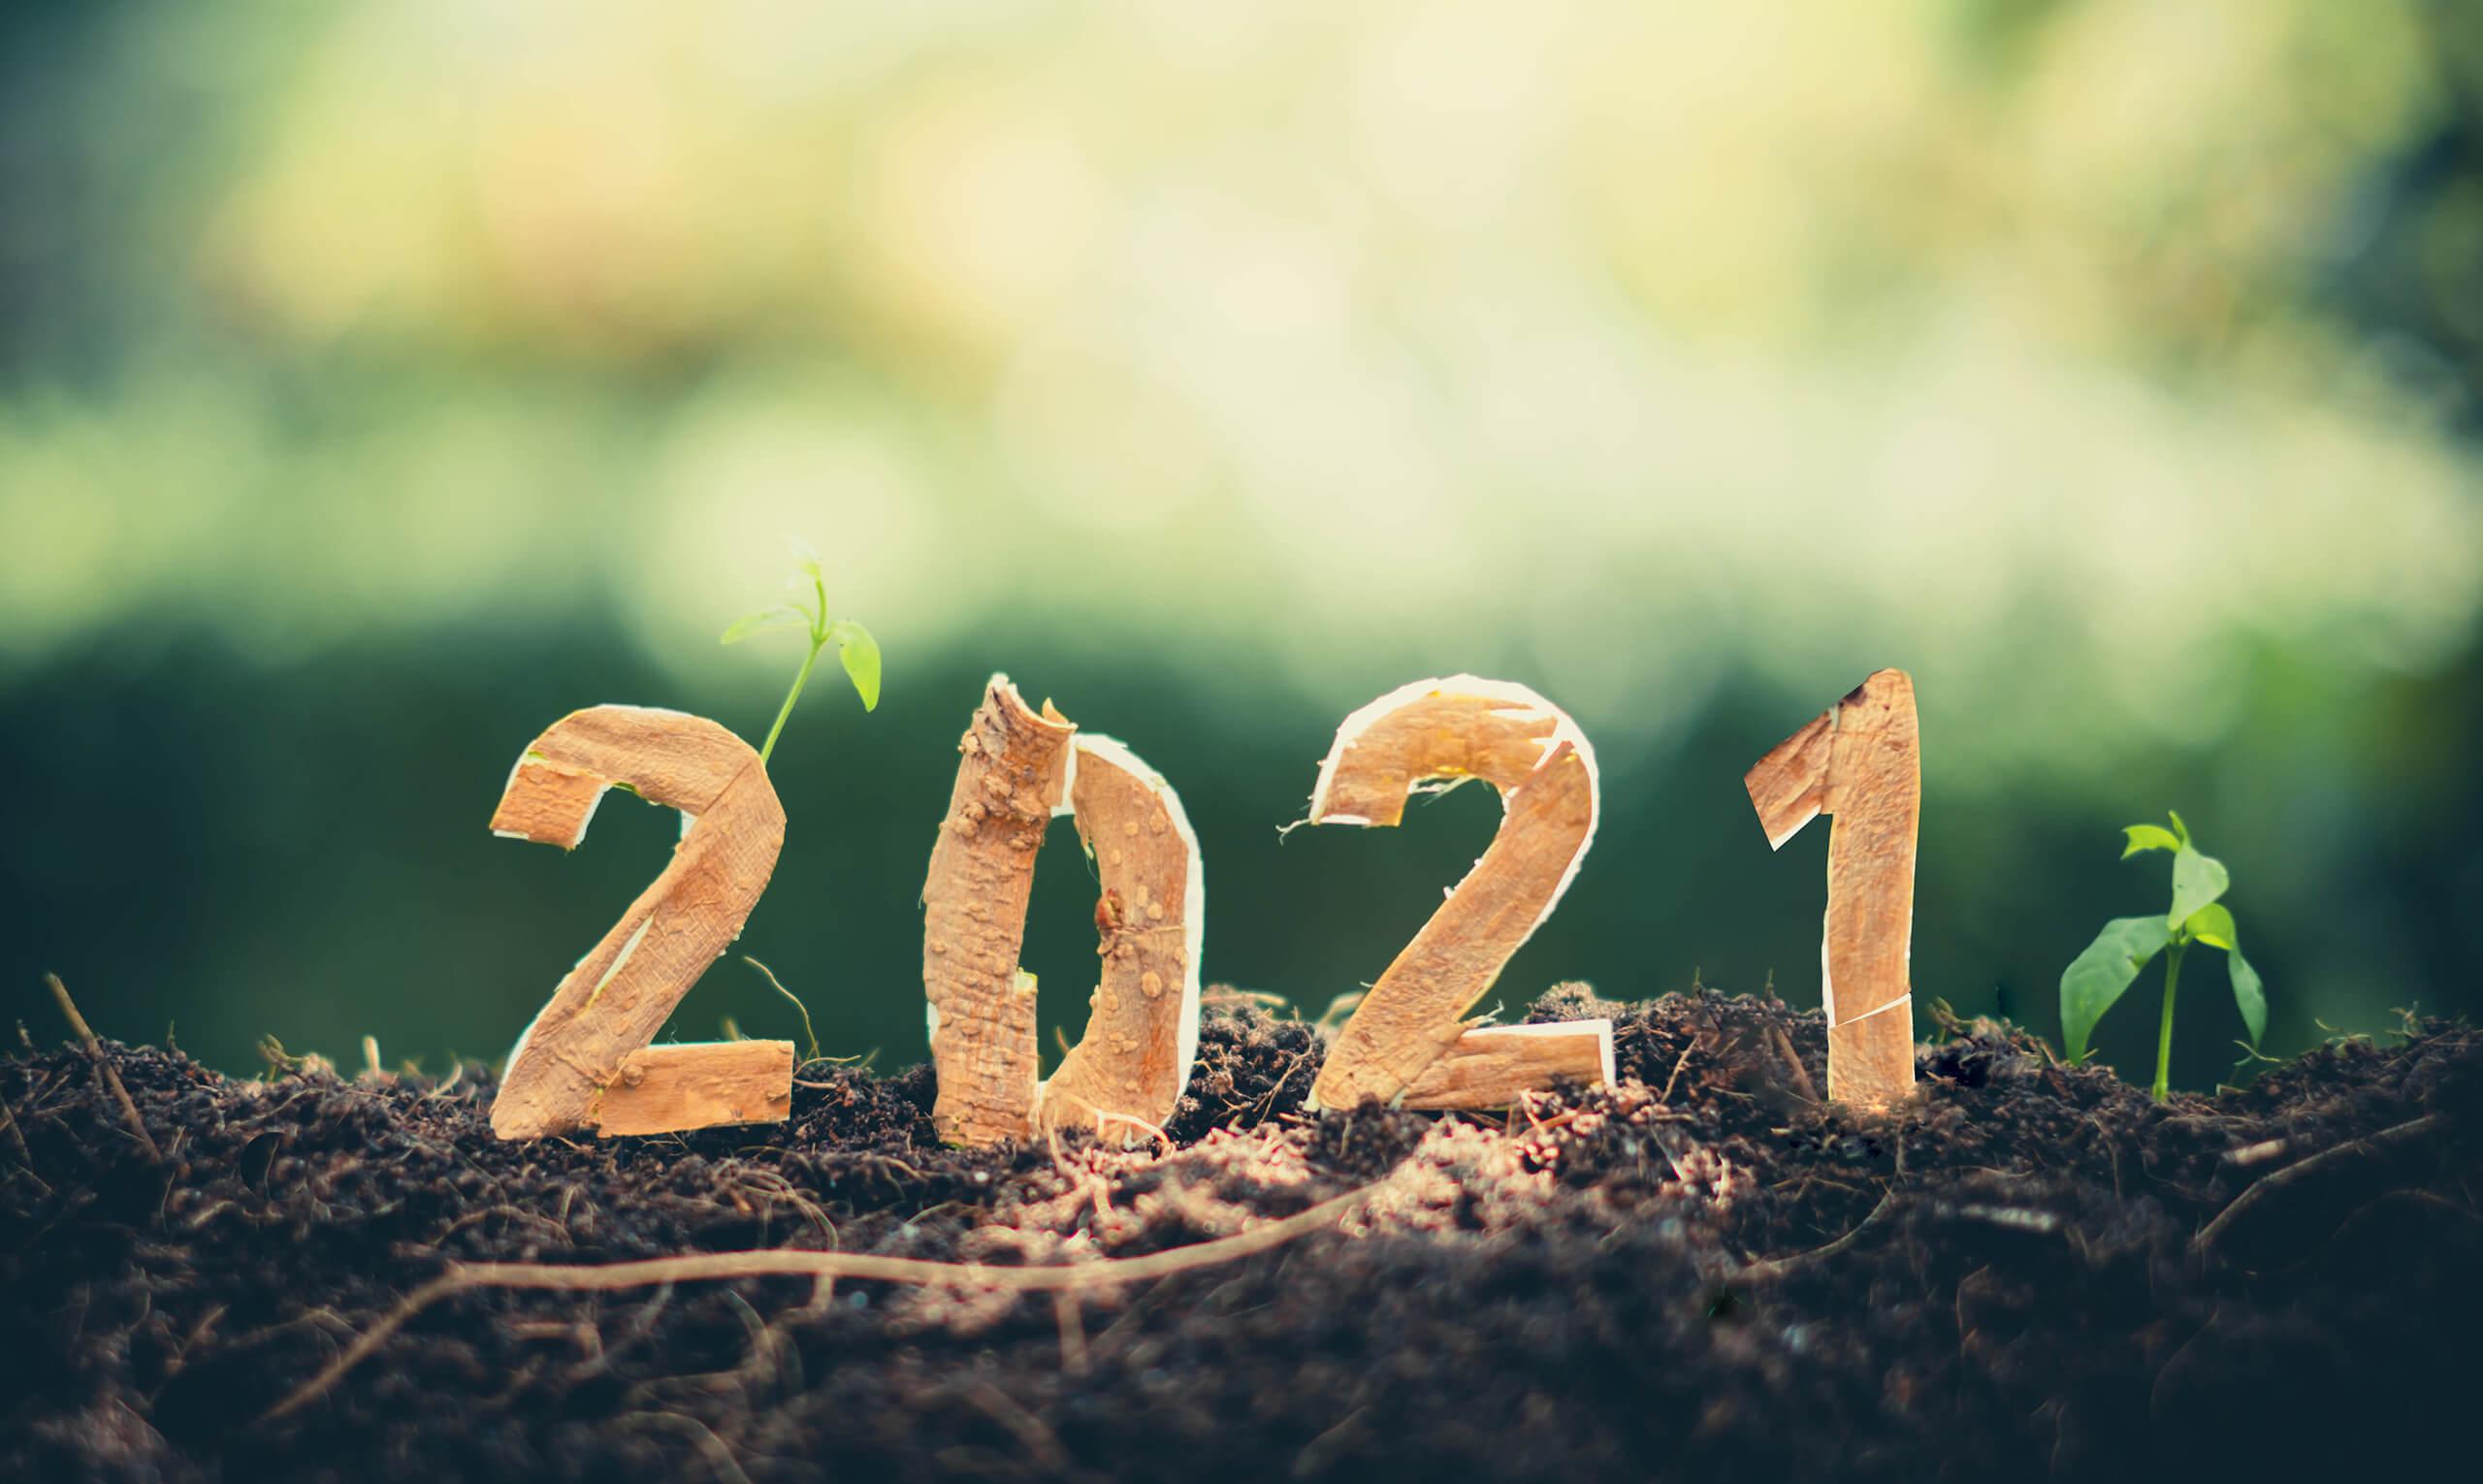 Superbonus 110 2021 - Green Systems srl blog post cover